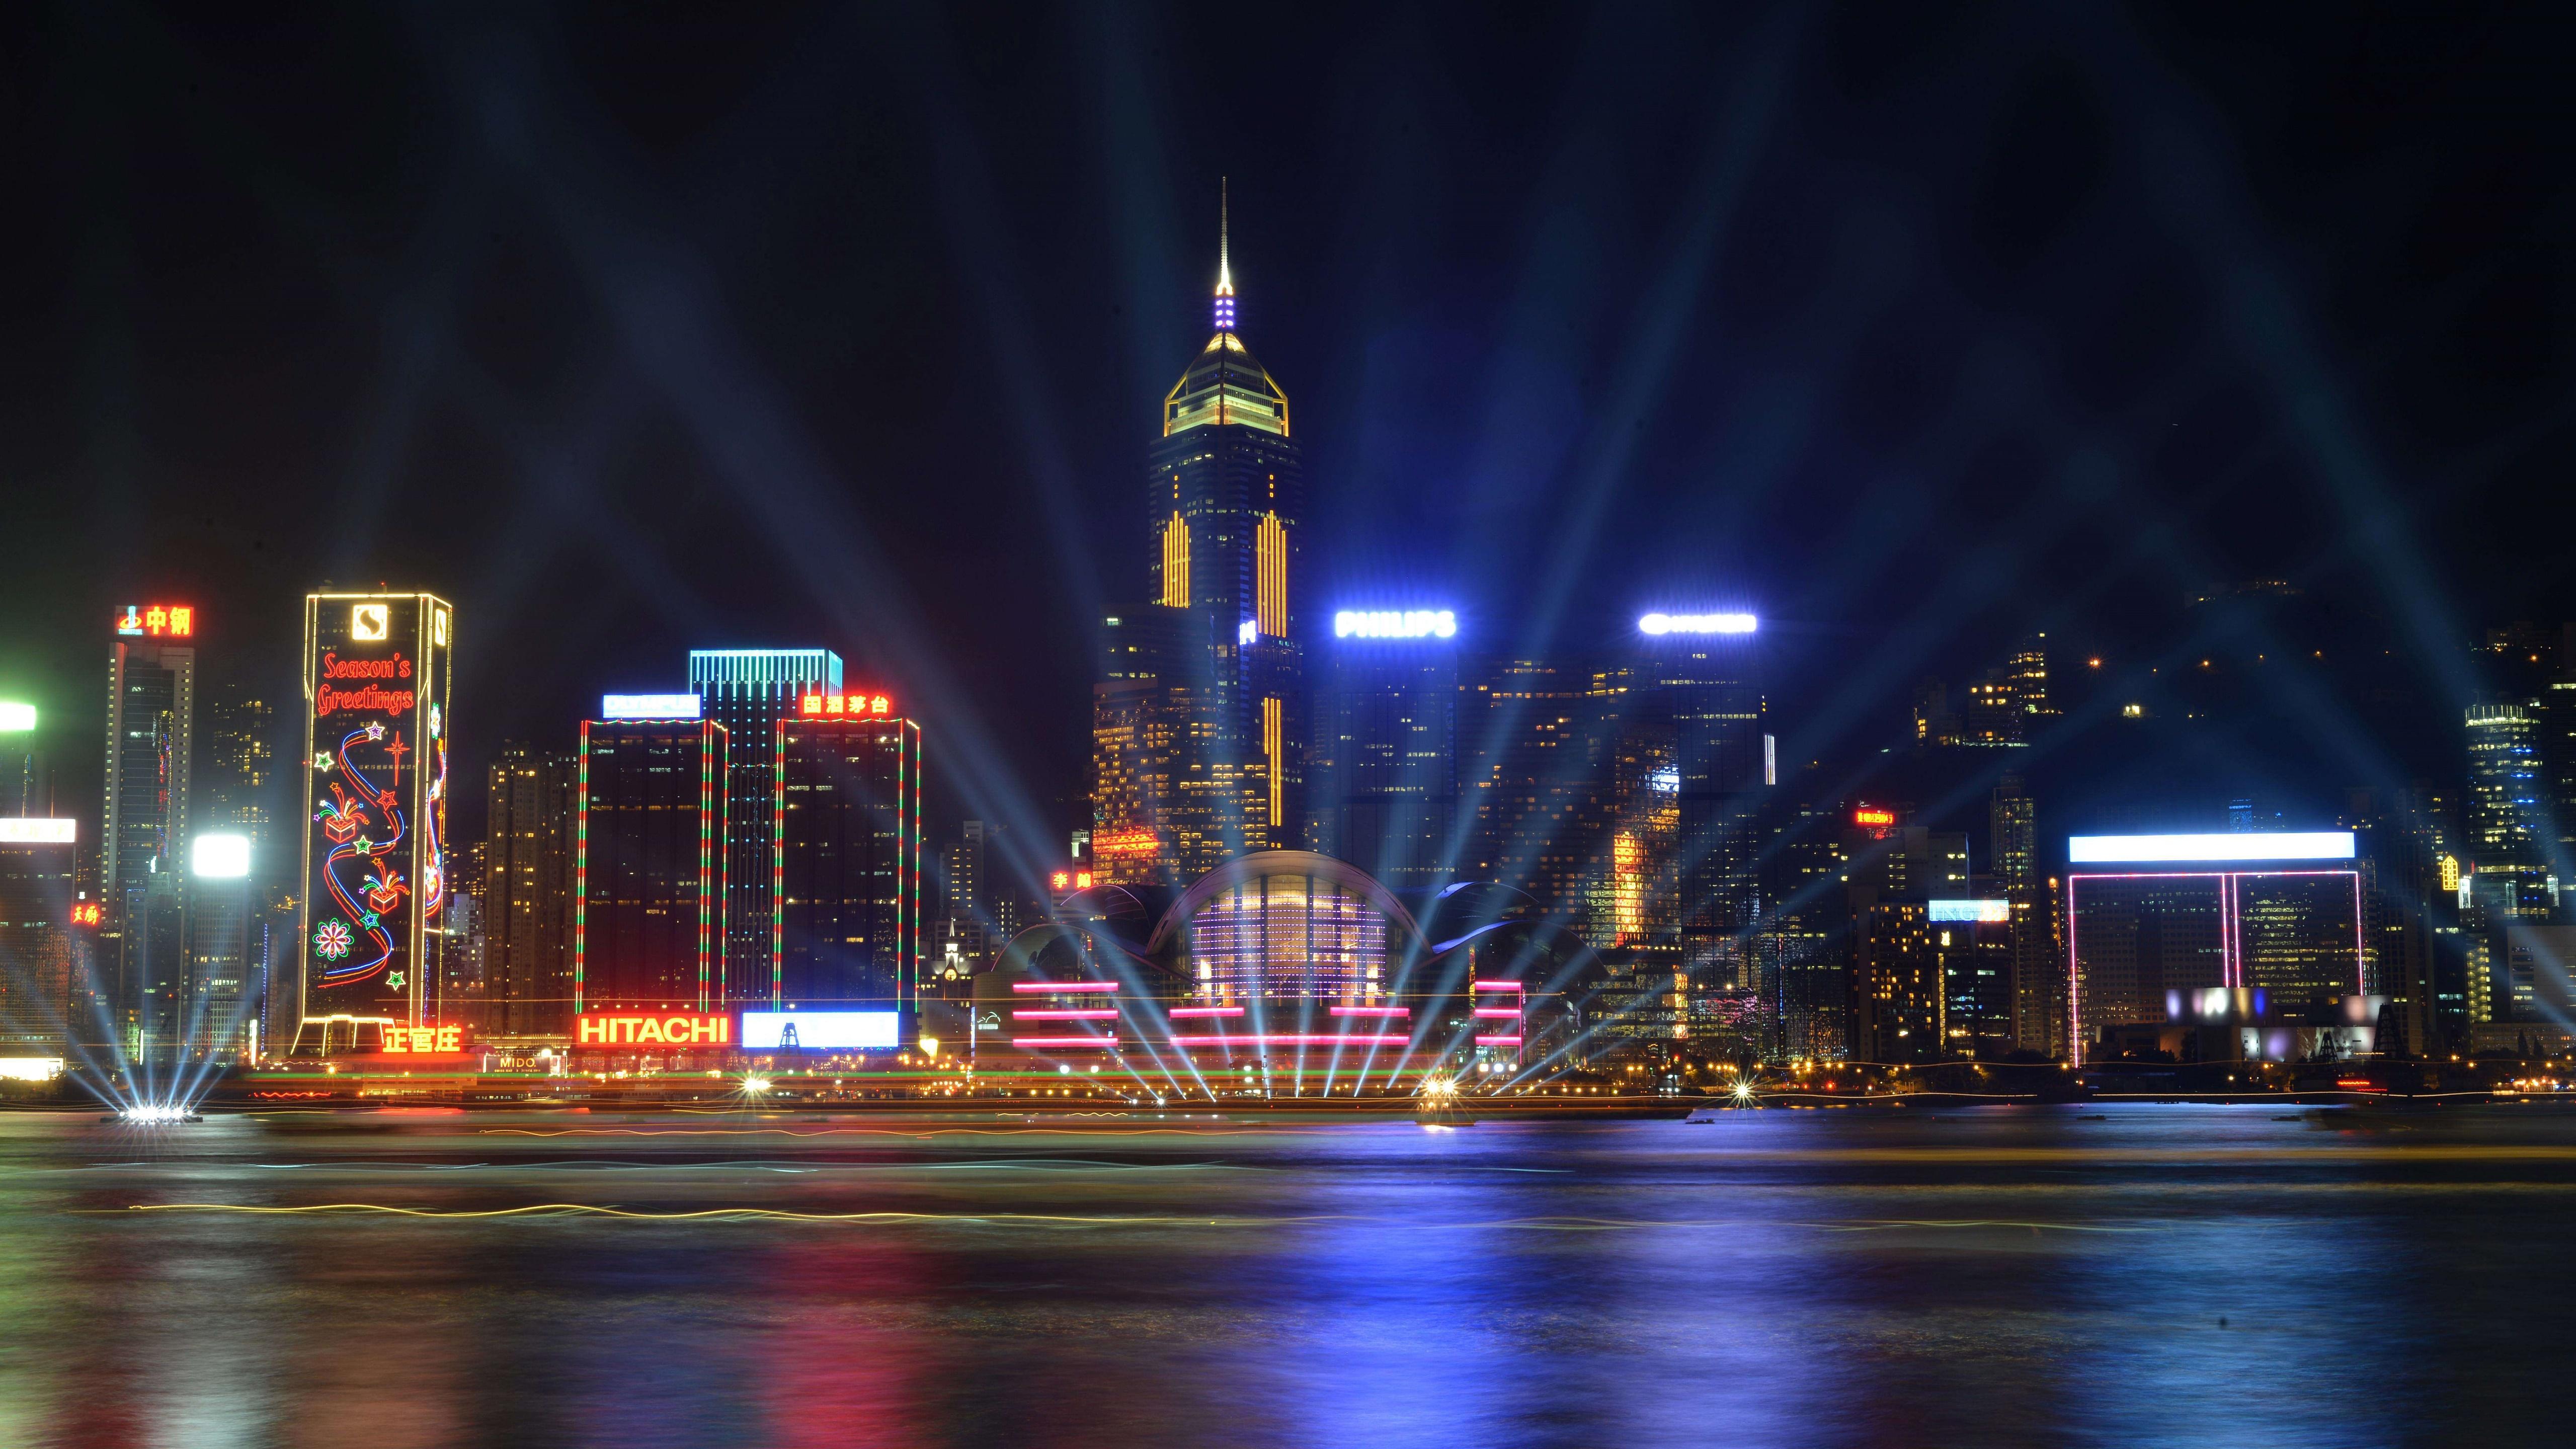 A Symphony of Lights (Wan Chai District) wallpaper